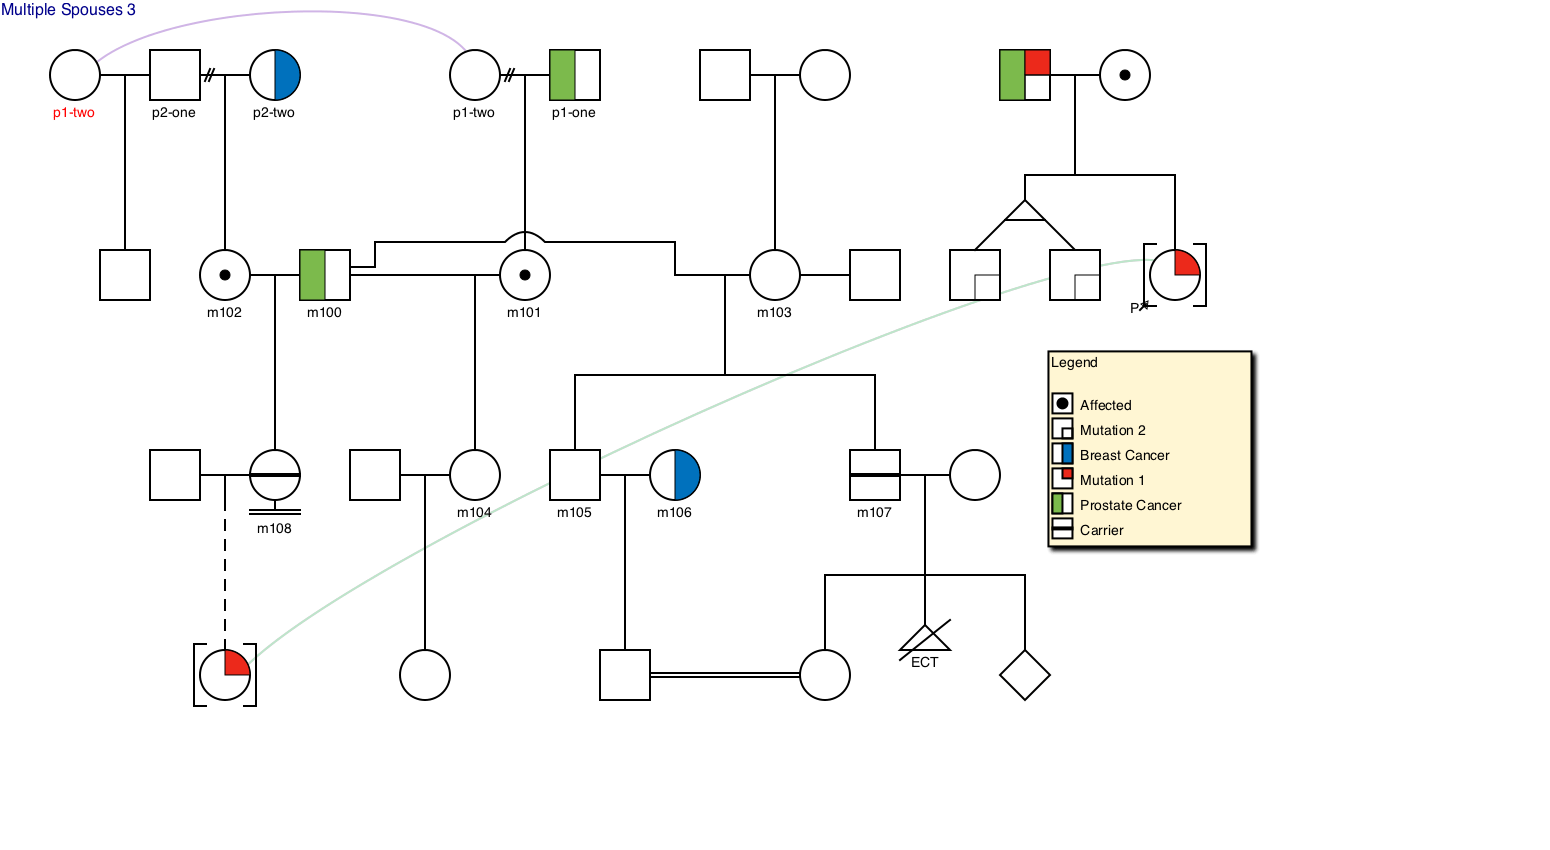 Genial Pedigree Draw Pedigree Drawing Software Genetic